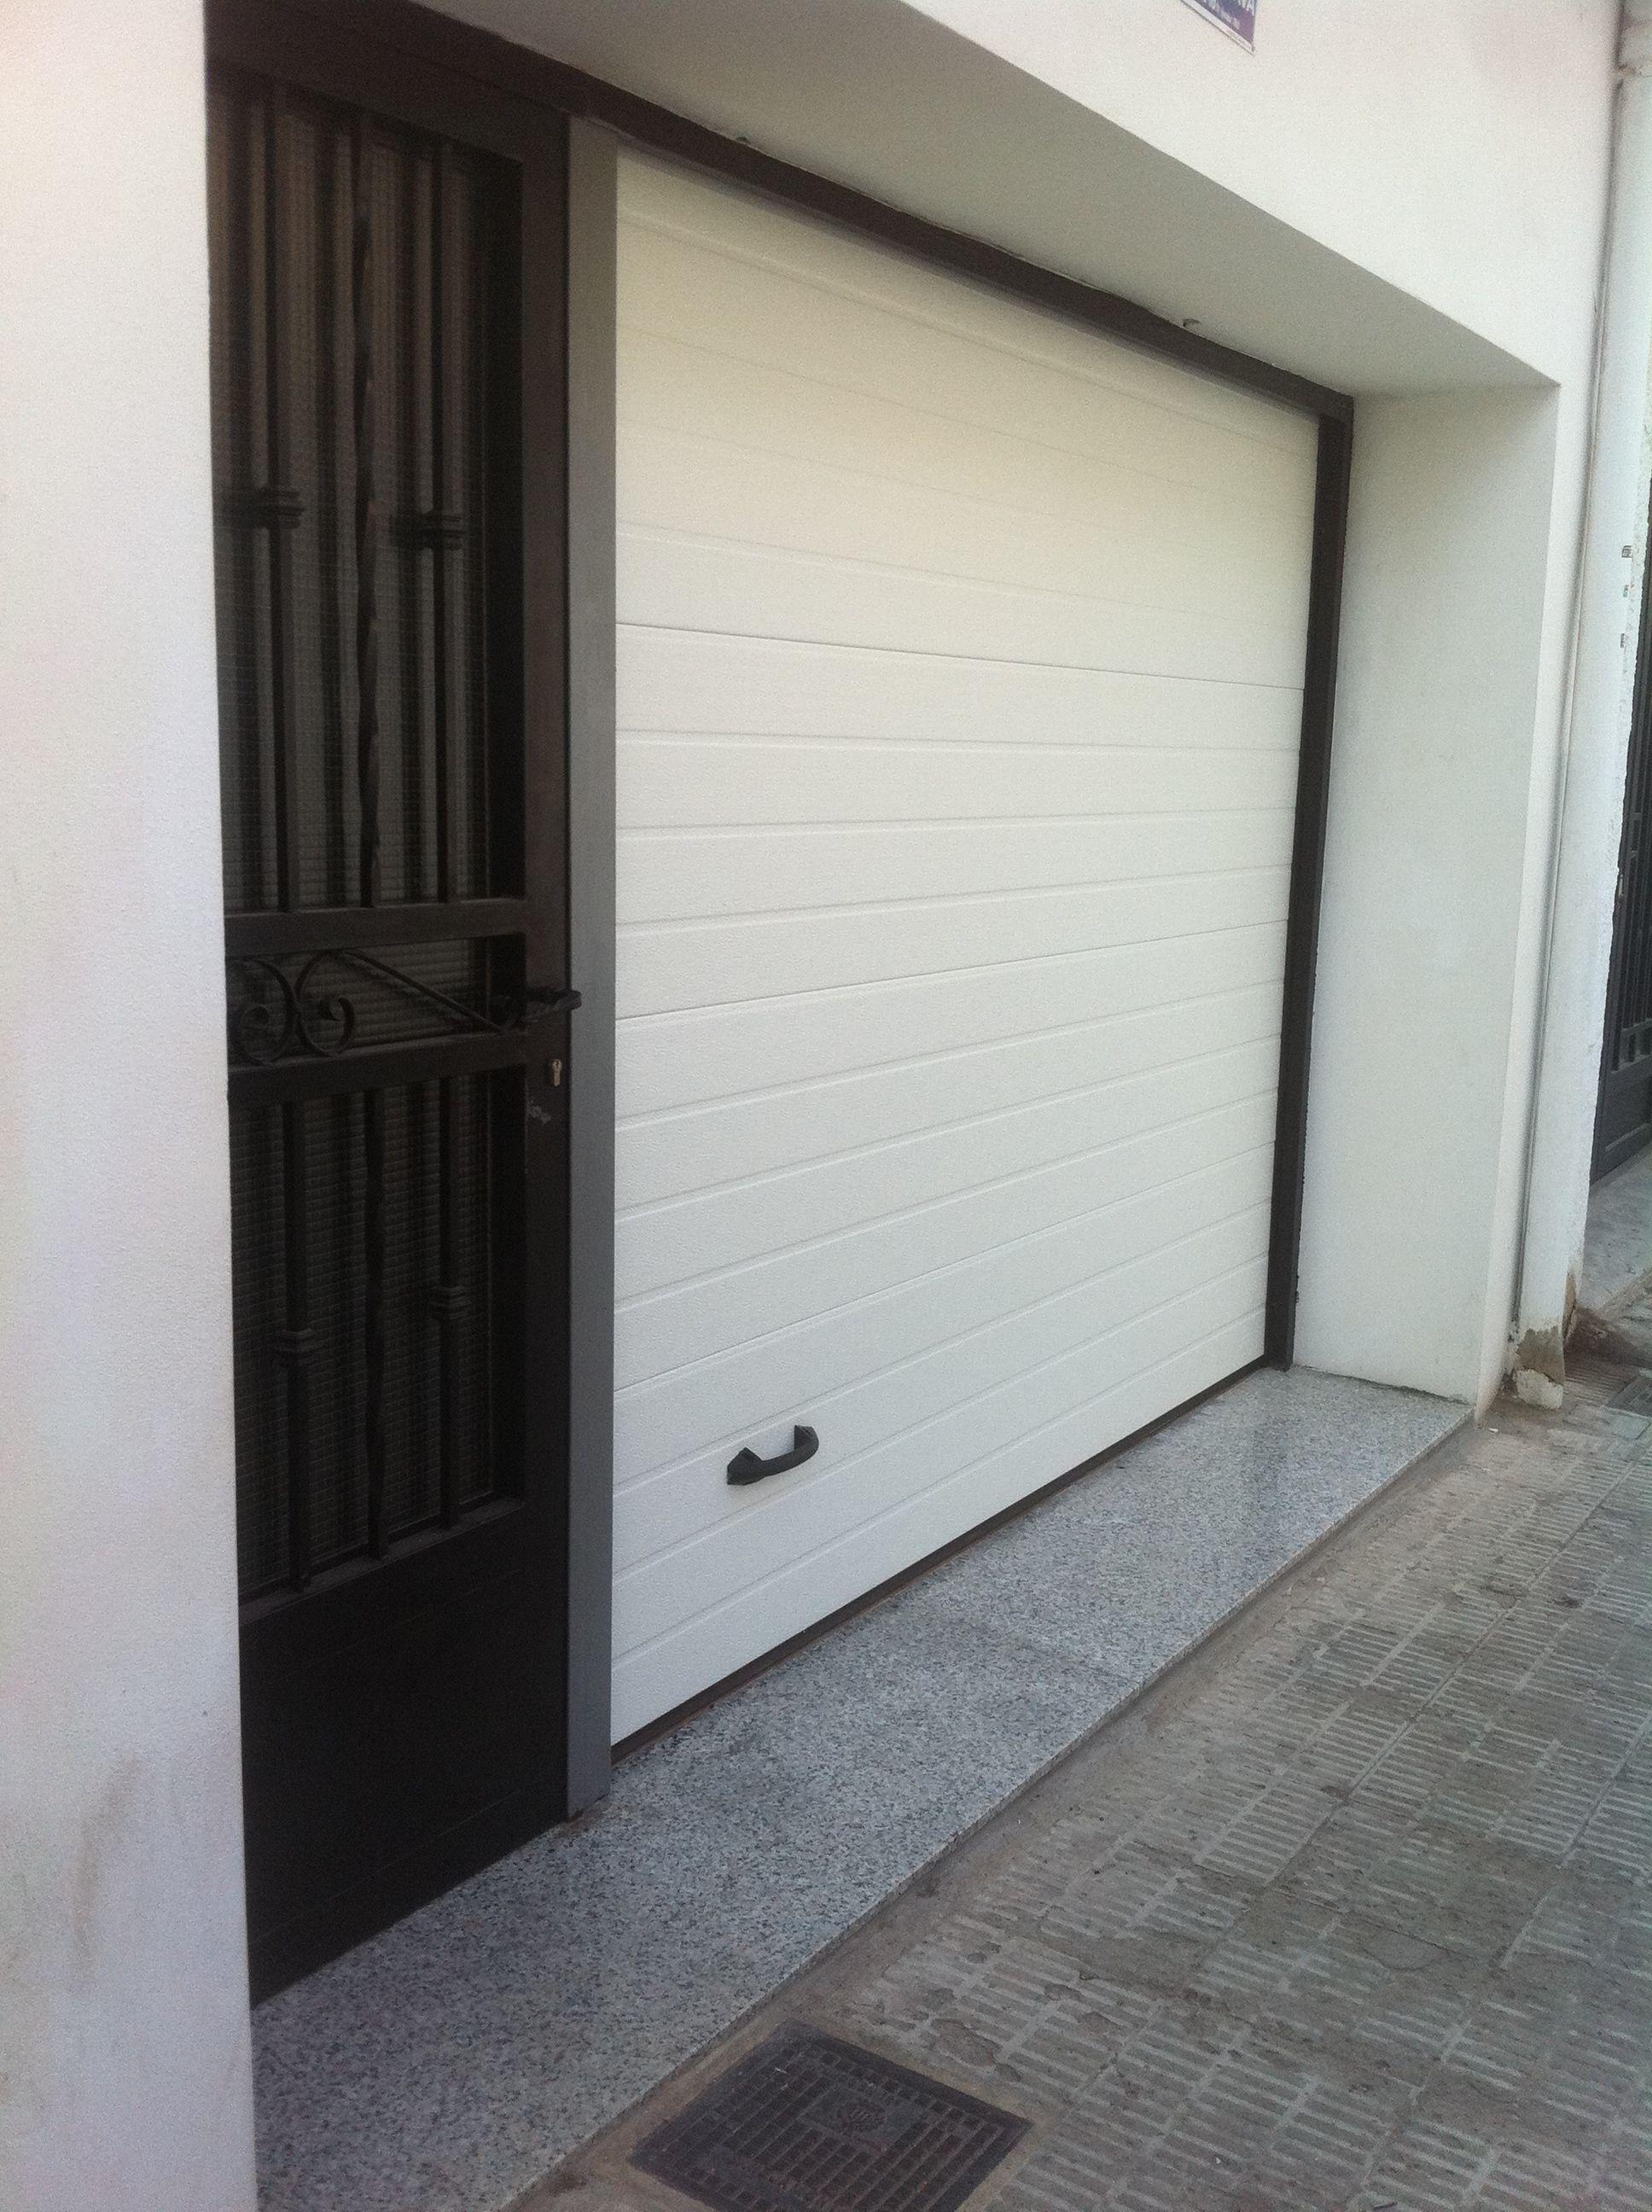 PUERTA SECCIONAL DE GARAJE.: Catálogo de Jgmaluminio